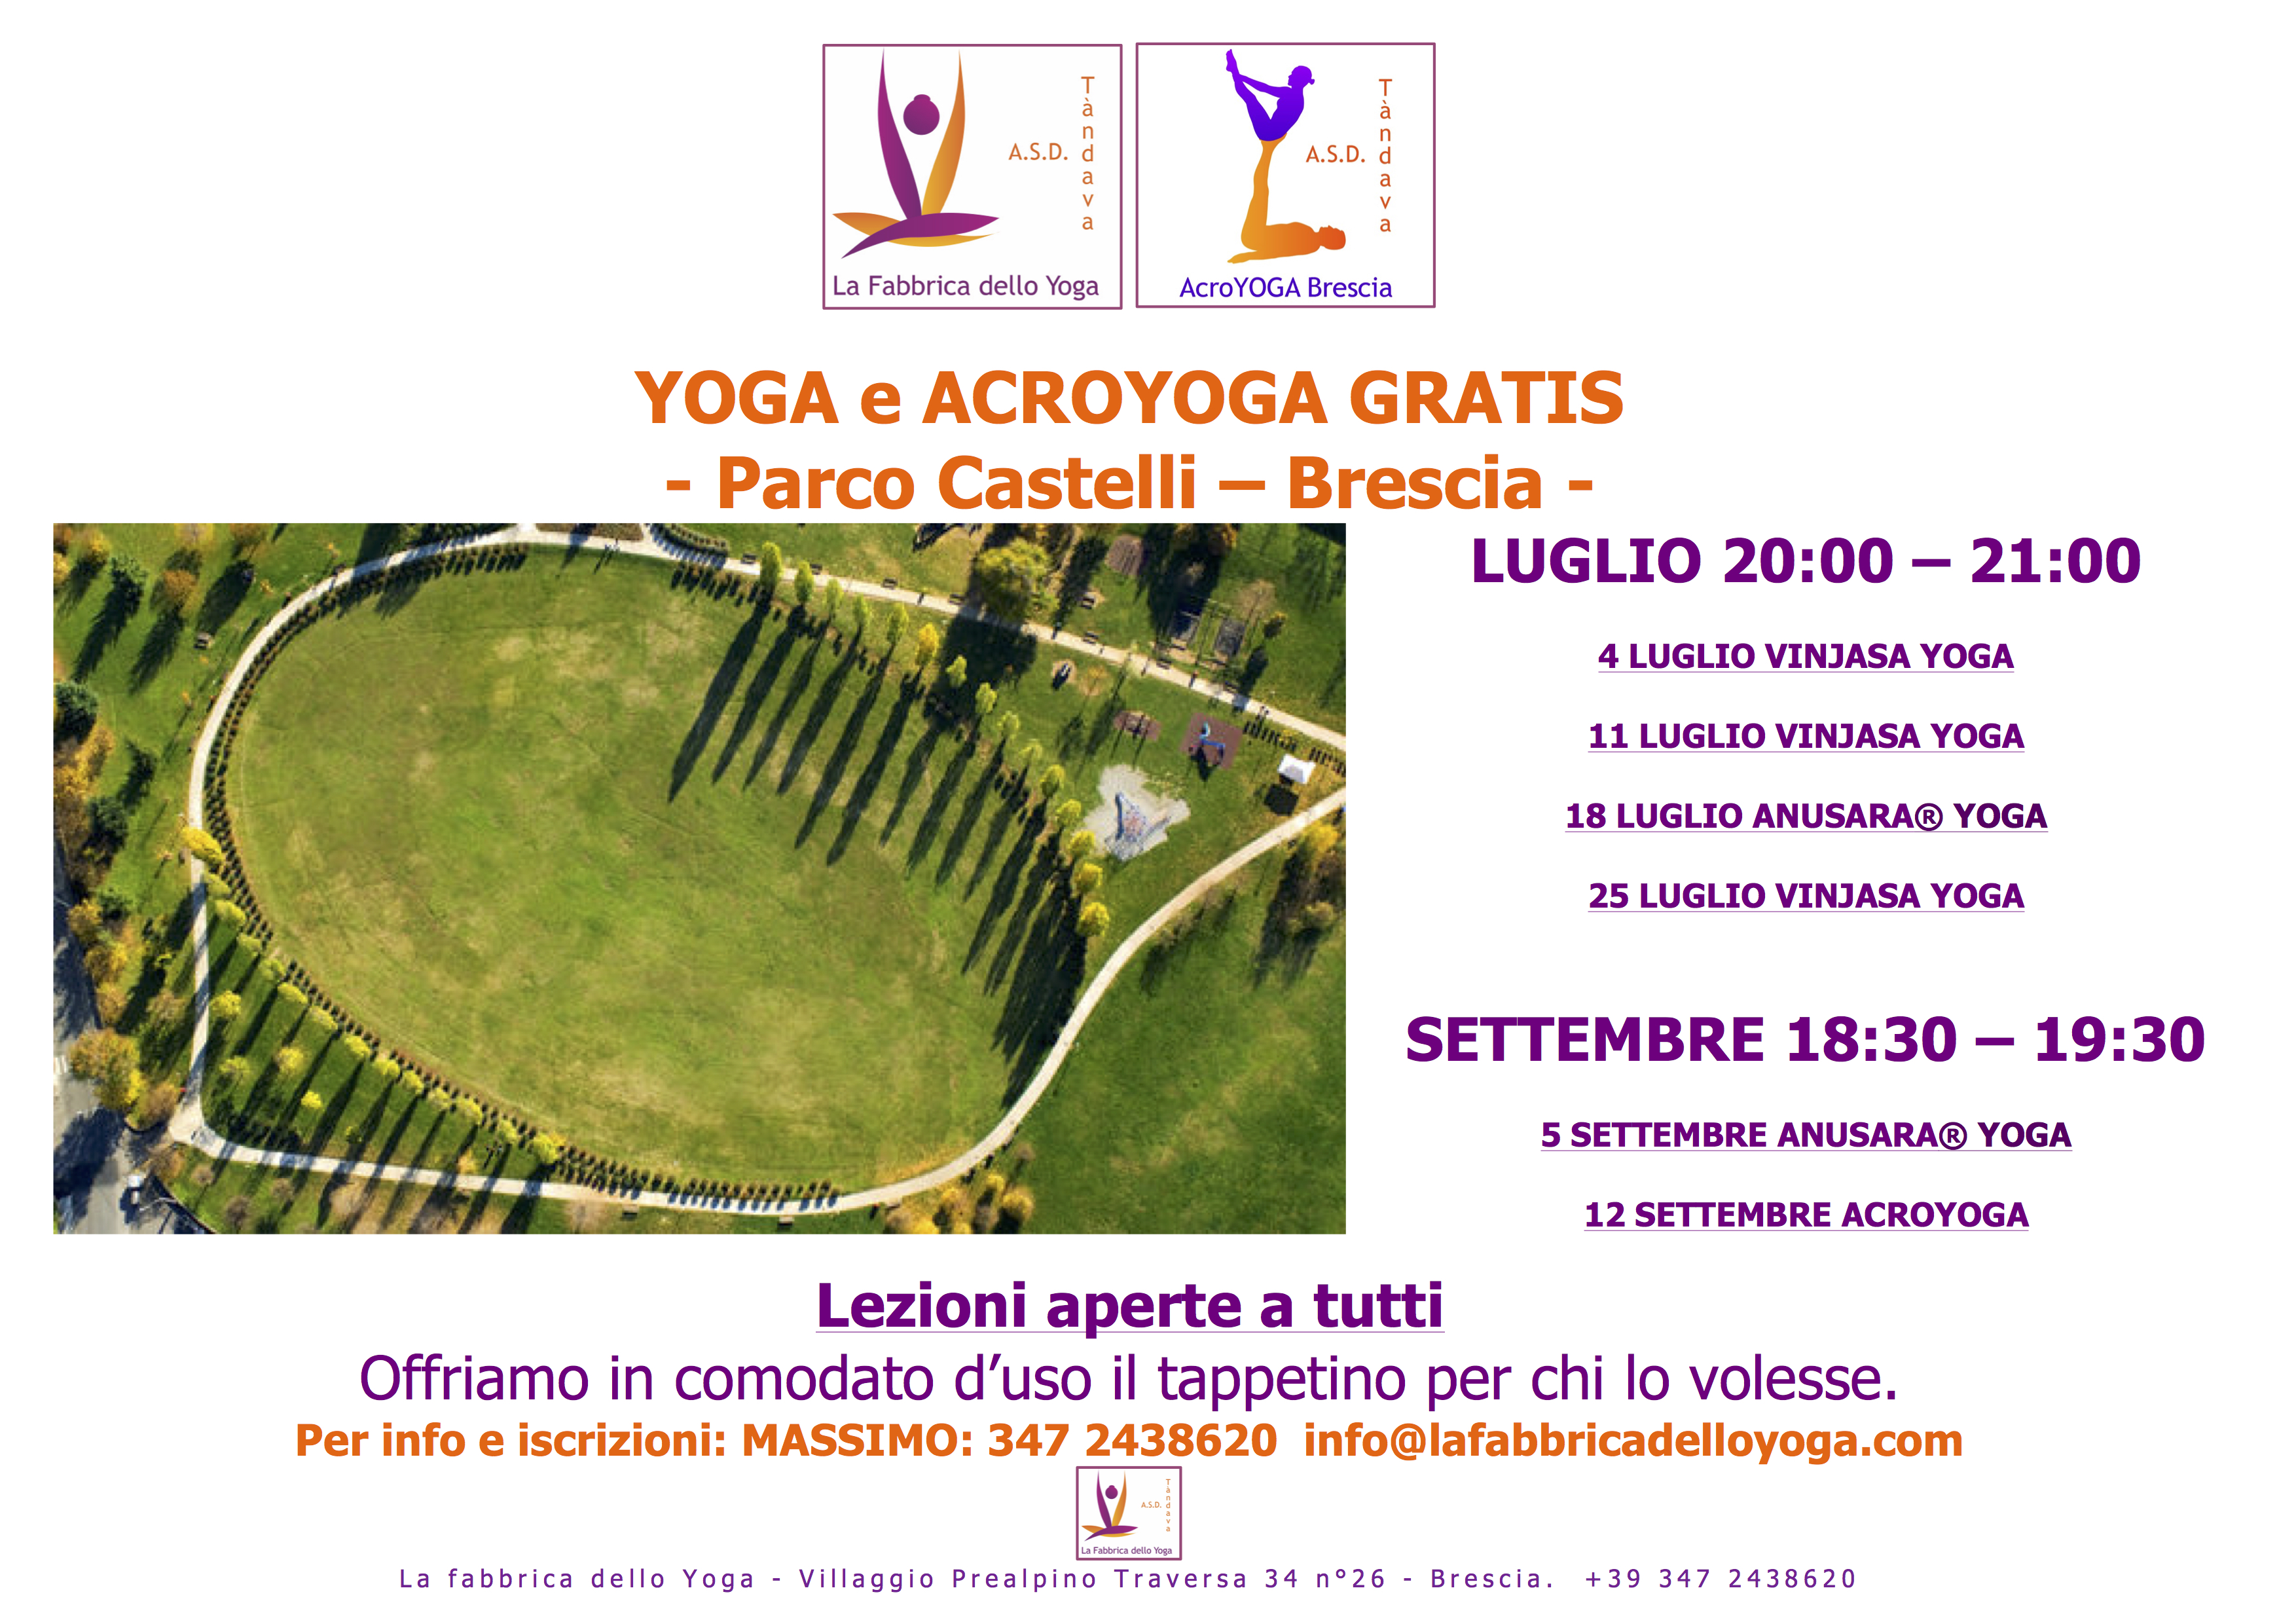 locandina yoga al parco castelli